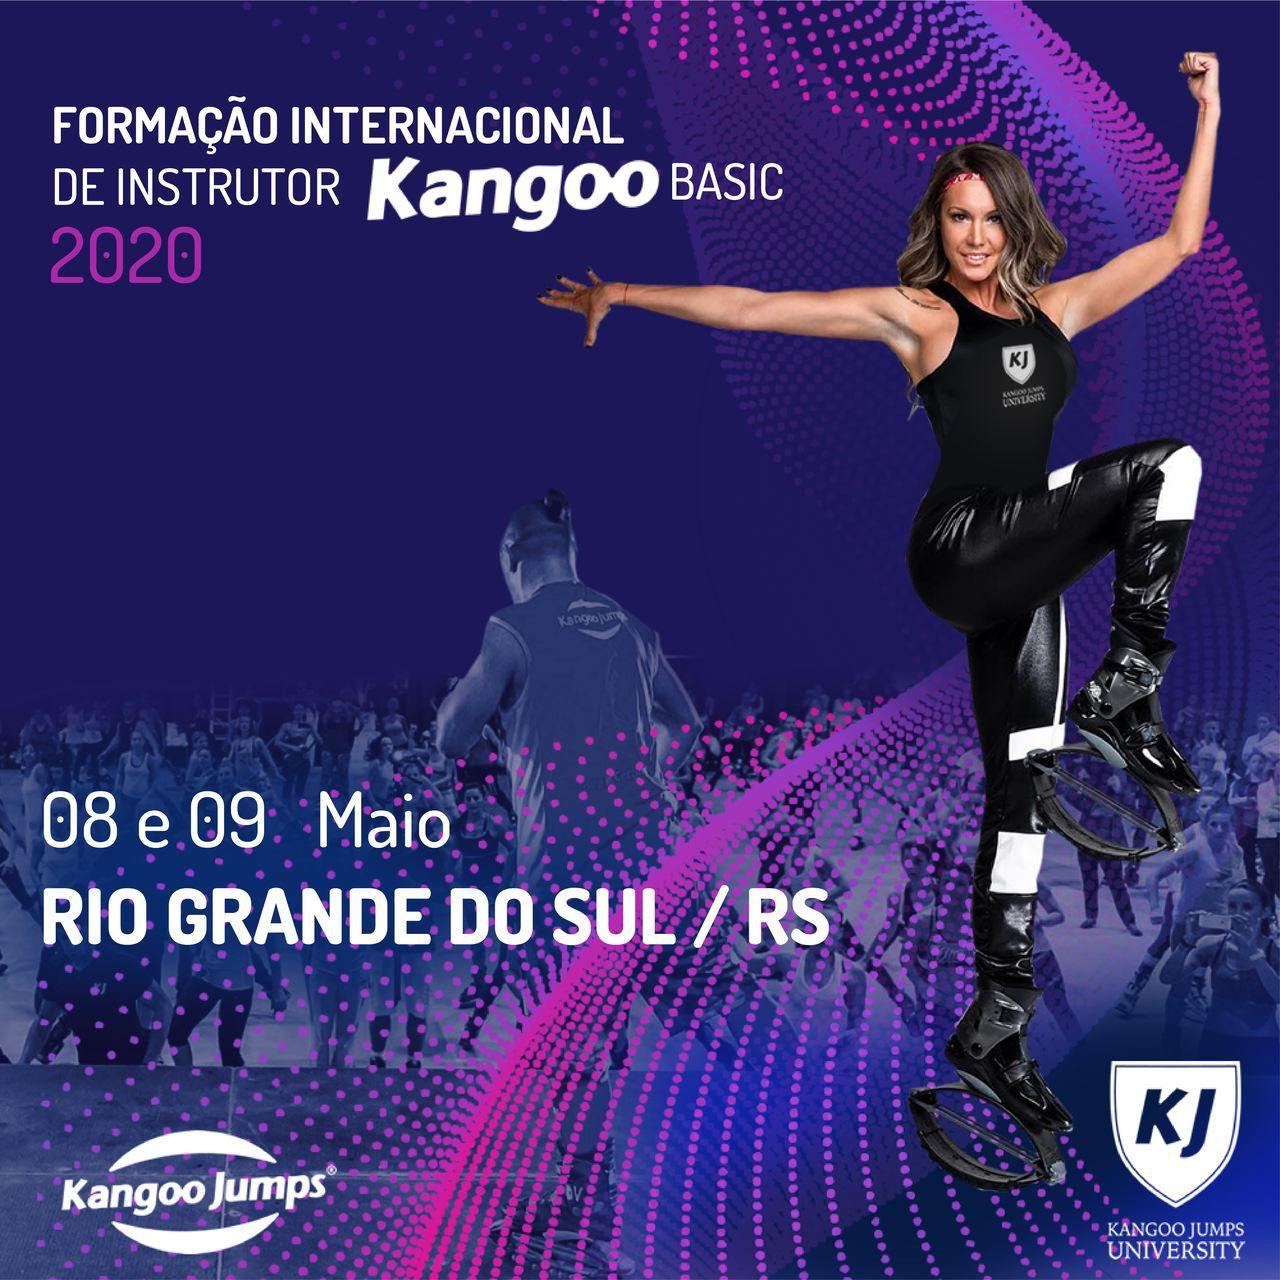 Kangoo Basic (Rio Grande do Sul - RS)